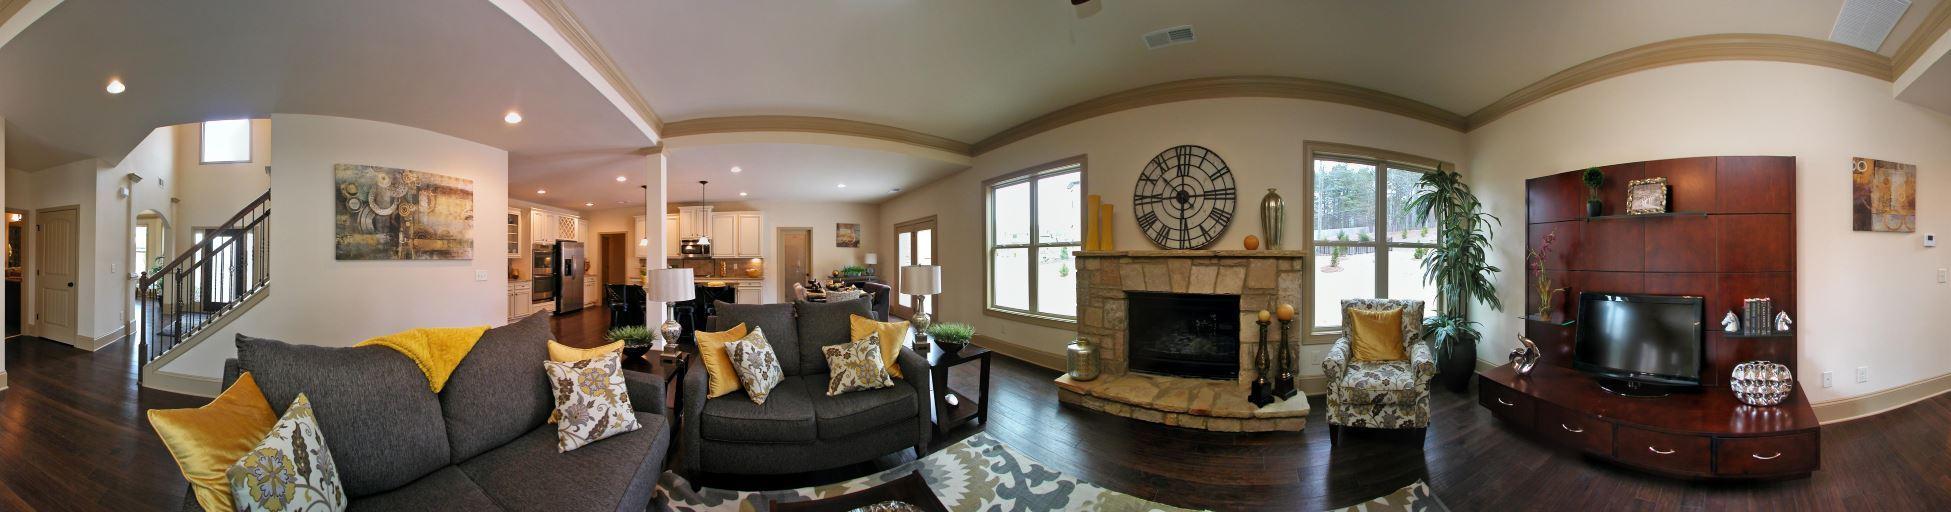 almont homes atlanta ga communities u0026 homes for sale newhomesource